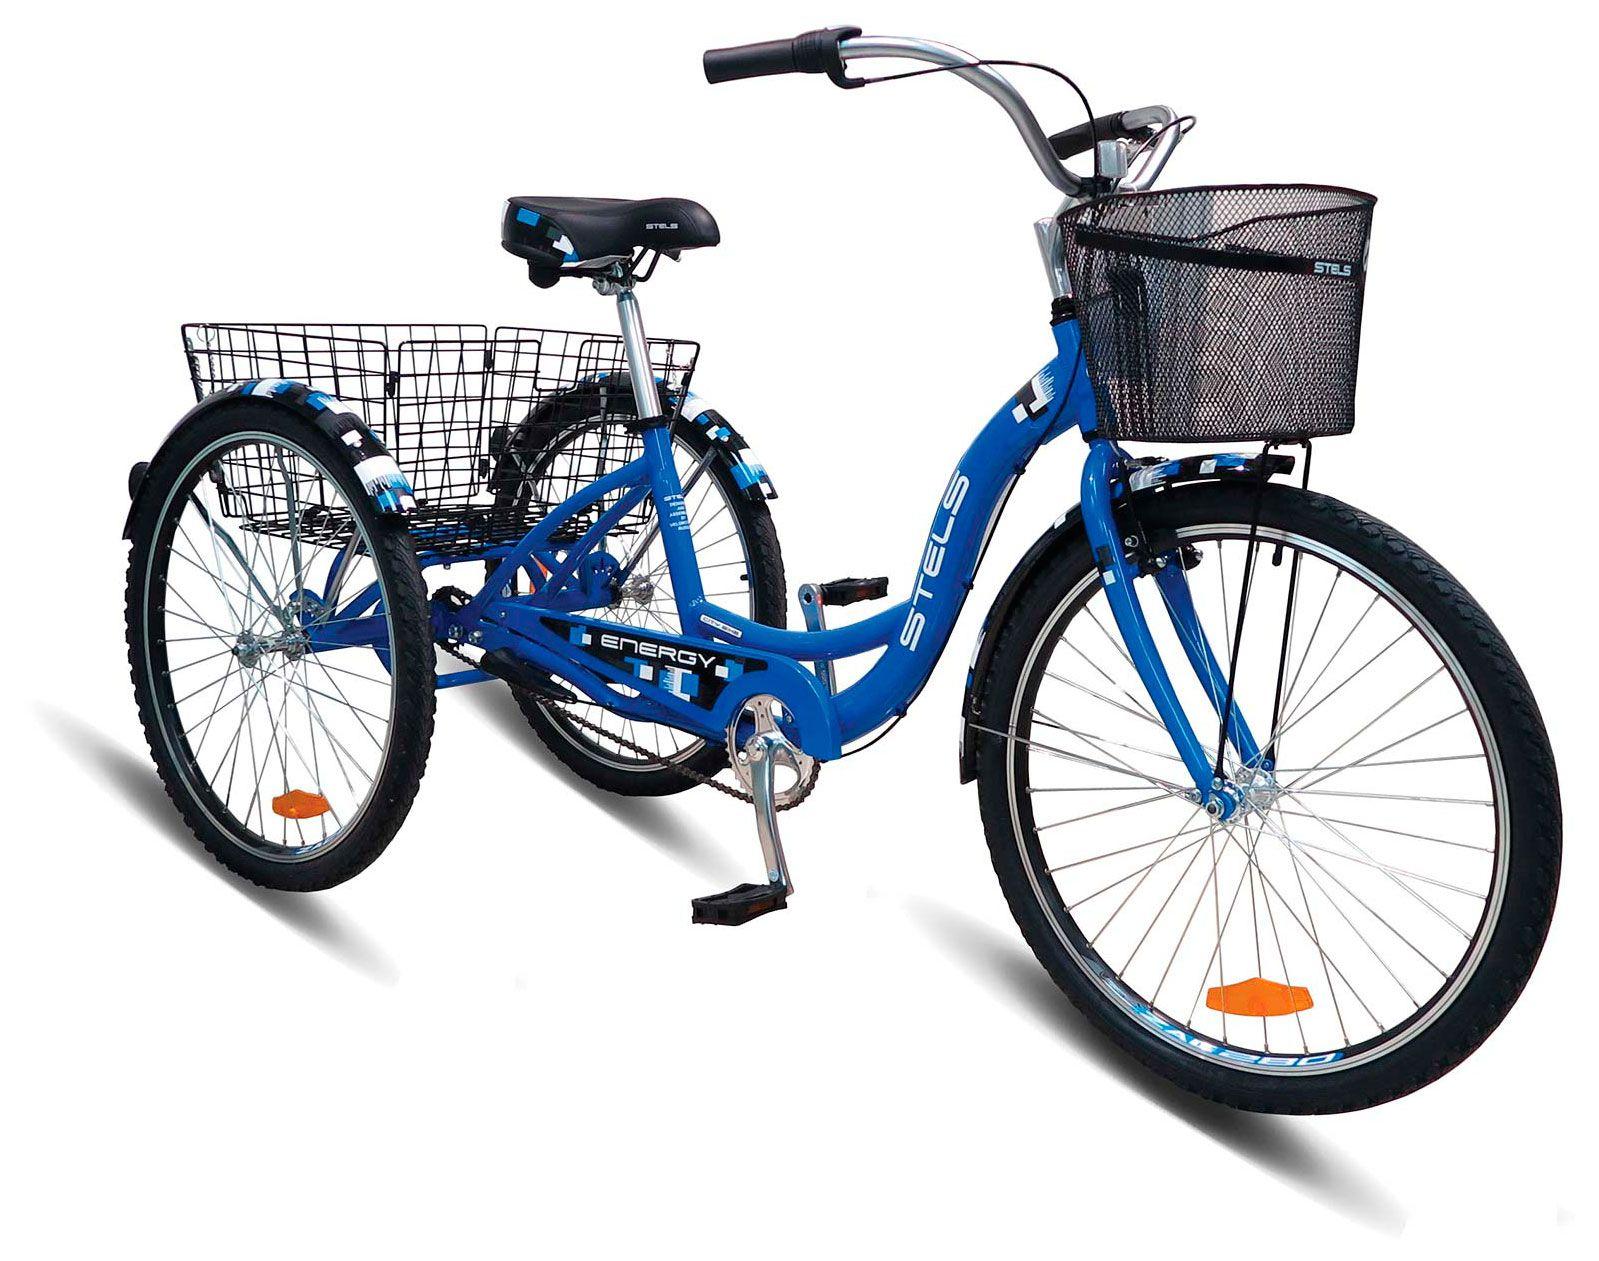 Велосипед Stels Energy-III 26 (V030) 2017 велосипед stels navigator 550 v 26 v030 2017